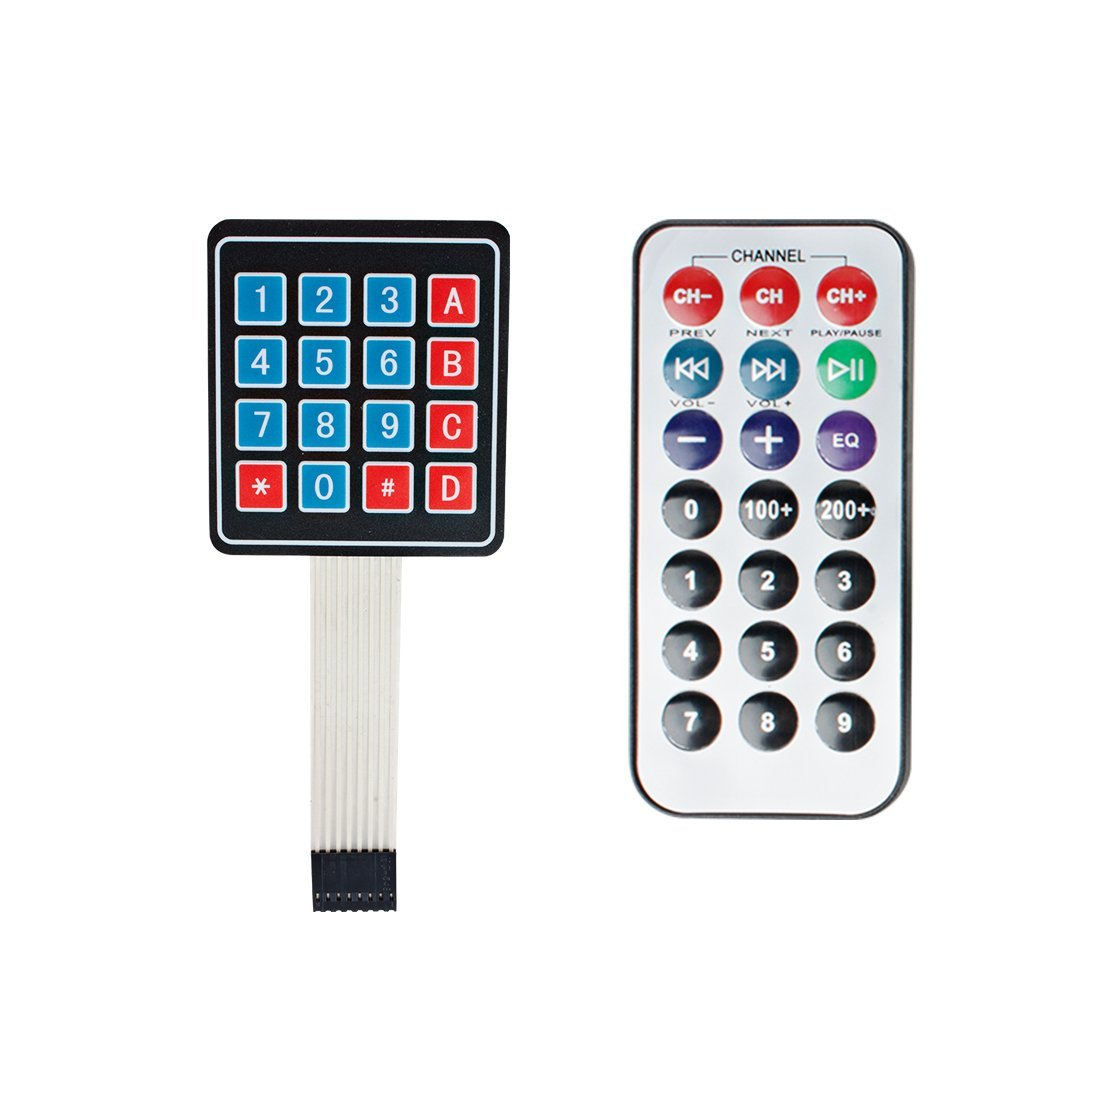 Amazon.com: DealMux UNO R3 final Starter Kit para Foundmental Arduino para DIY singlechip Arduino: Electronics